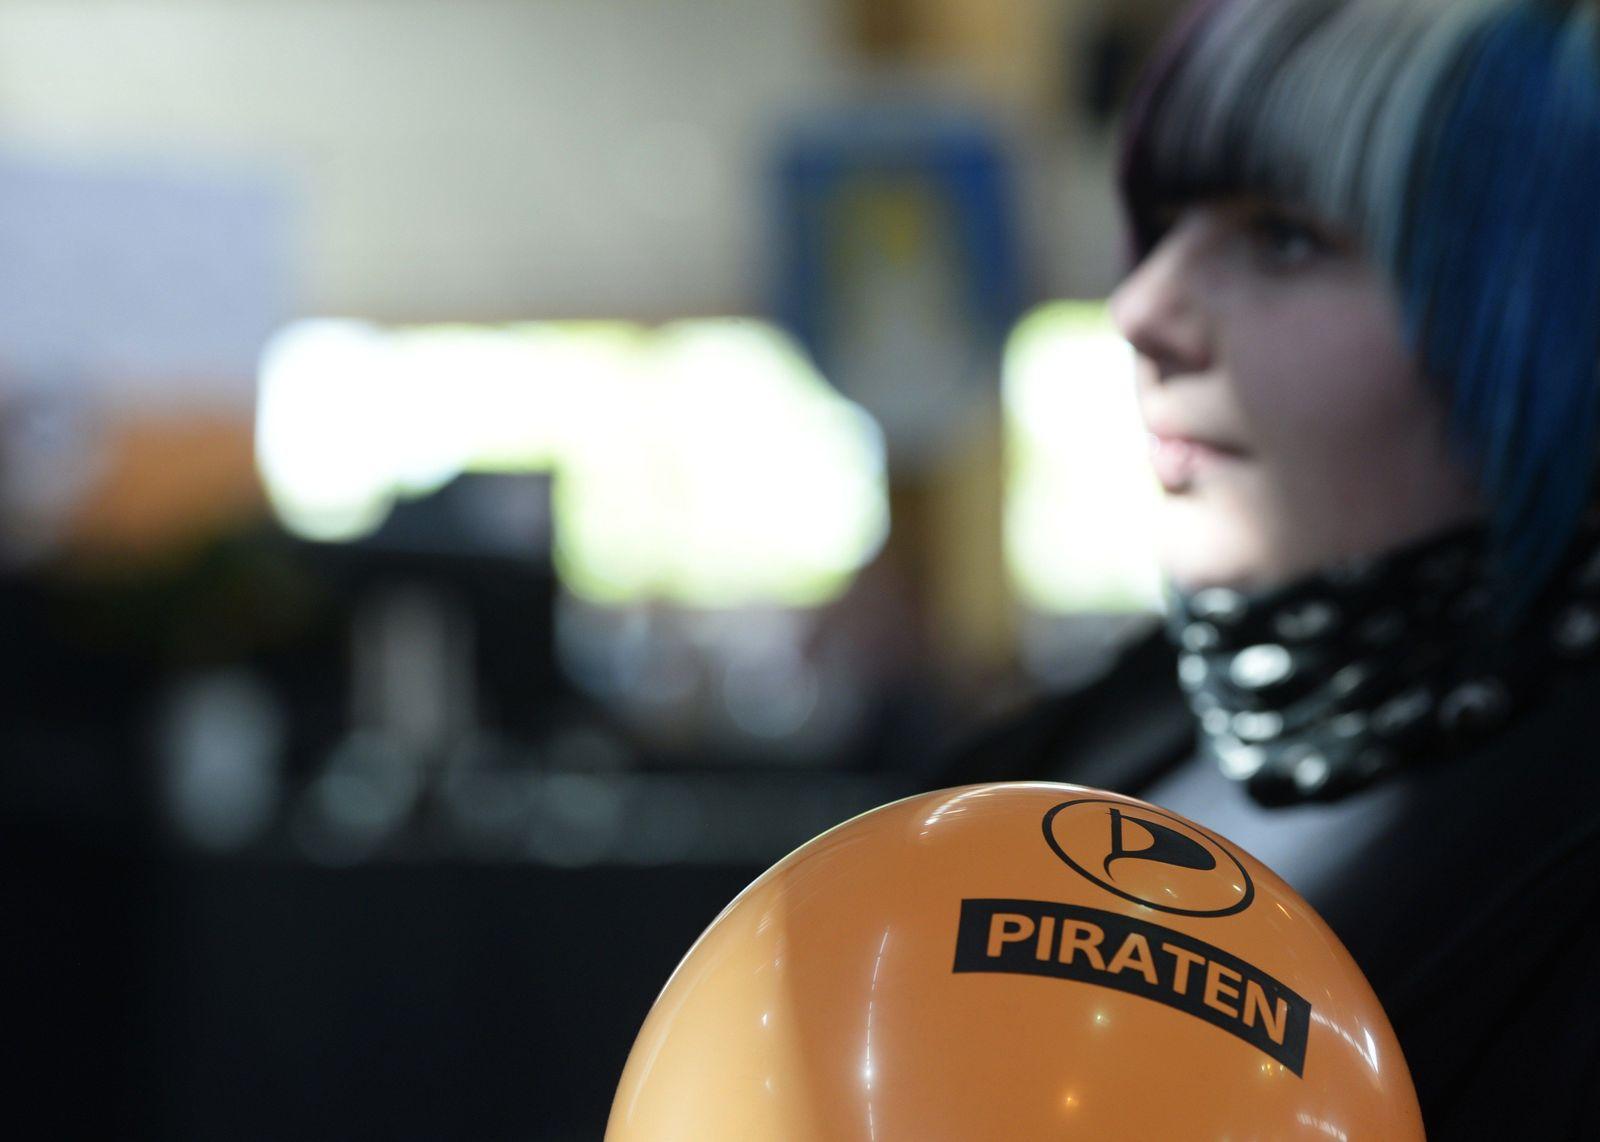 Piratenpartei / Parteitag